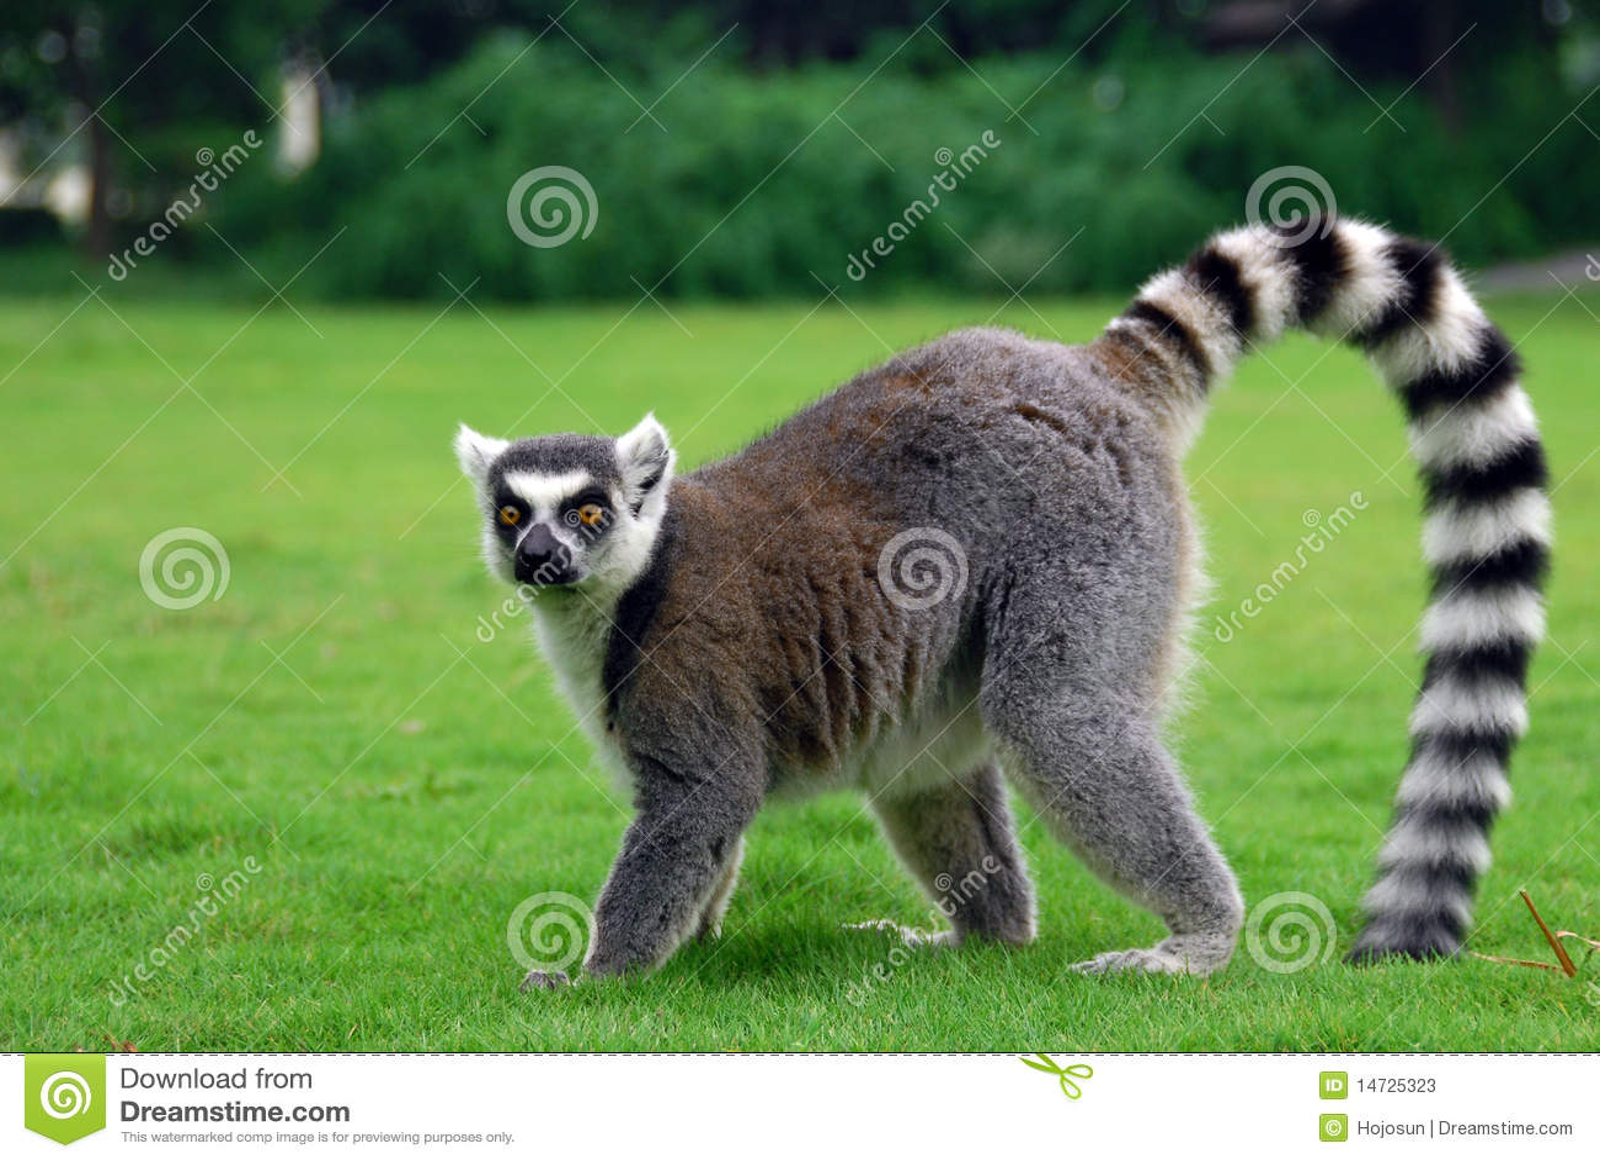 ring tailed lemur stock image image of grey ringed 14725323